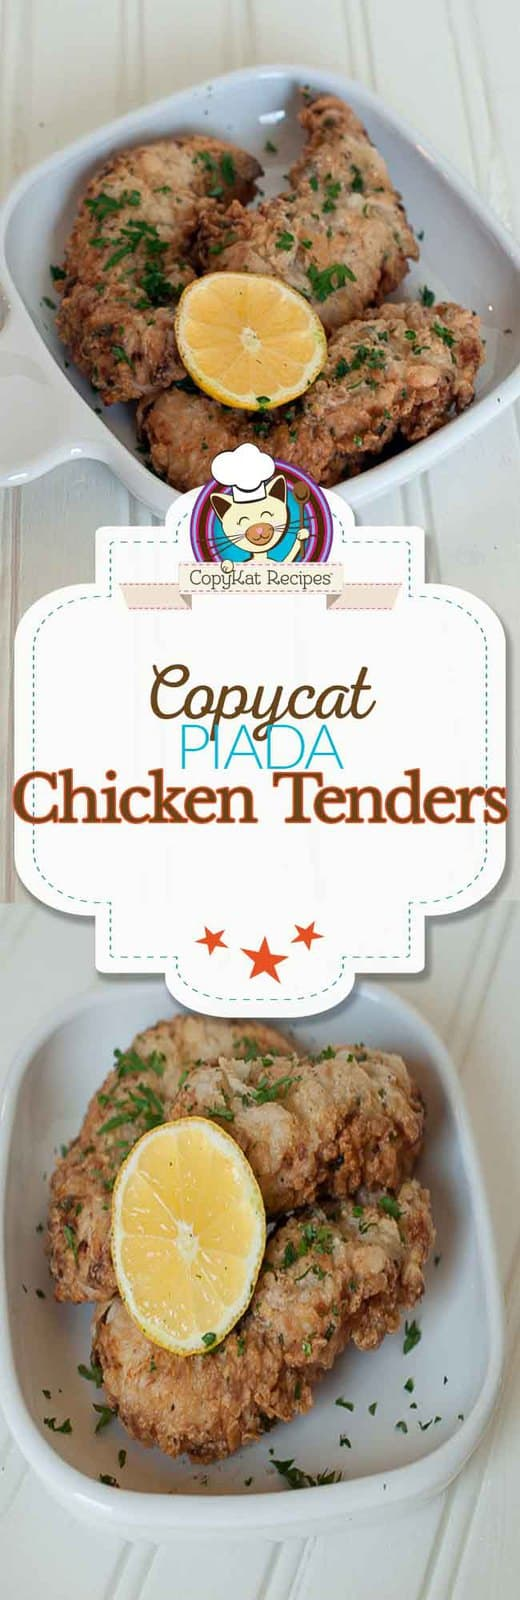 Piada Chicken Tenders